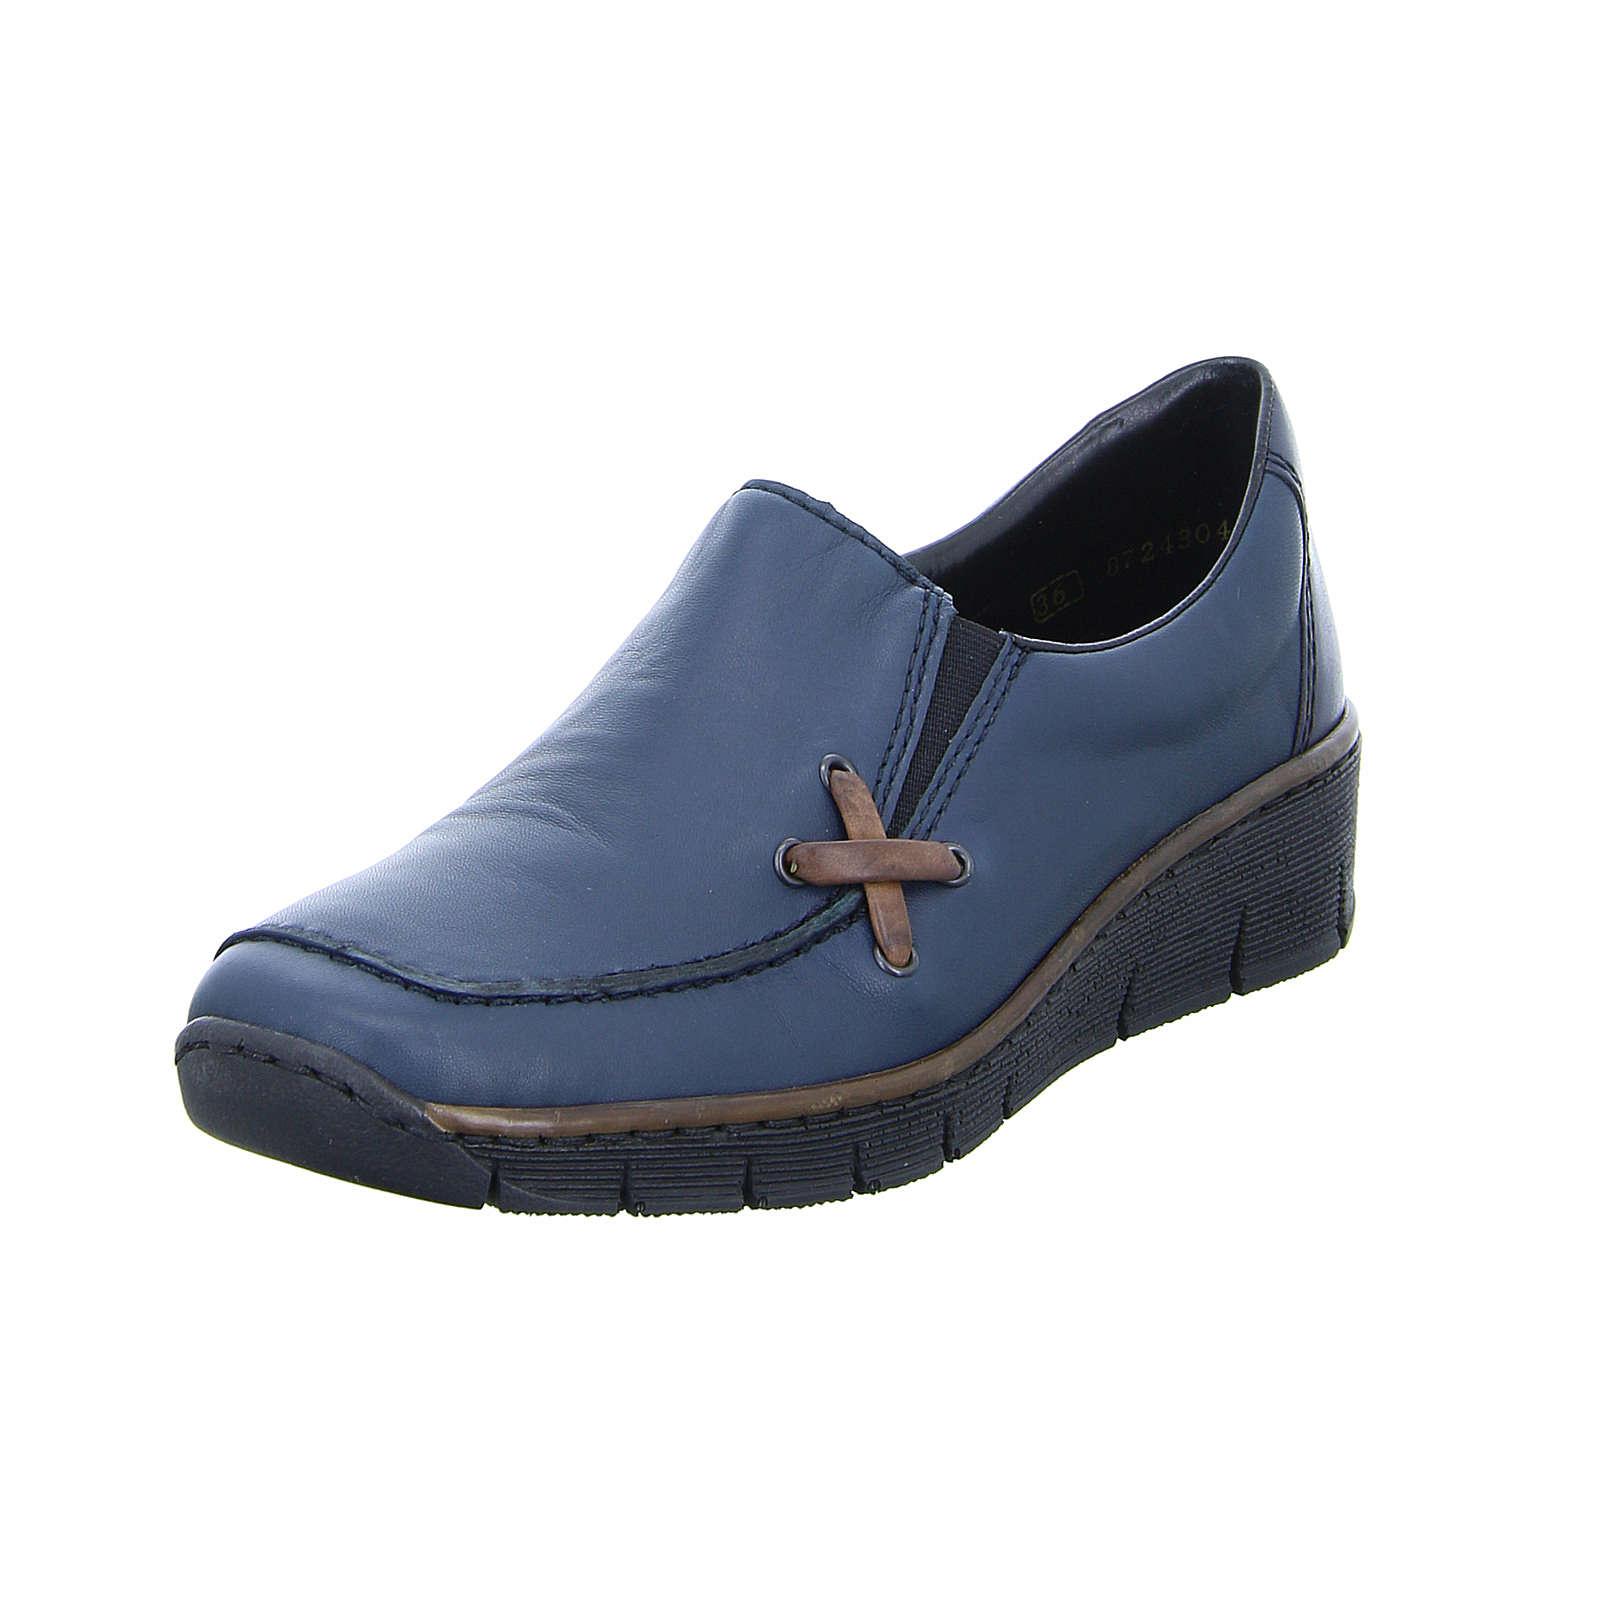 rieker Slipper blau Damen Gr. 36